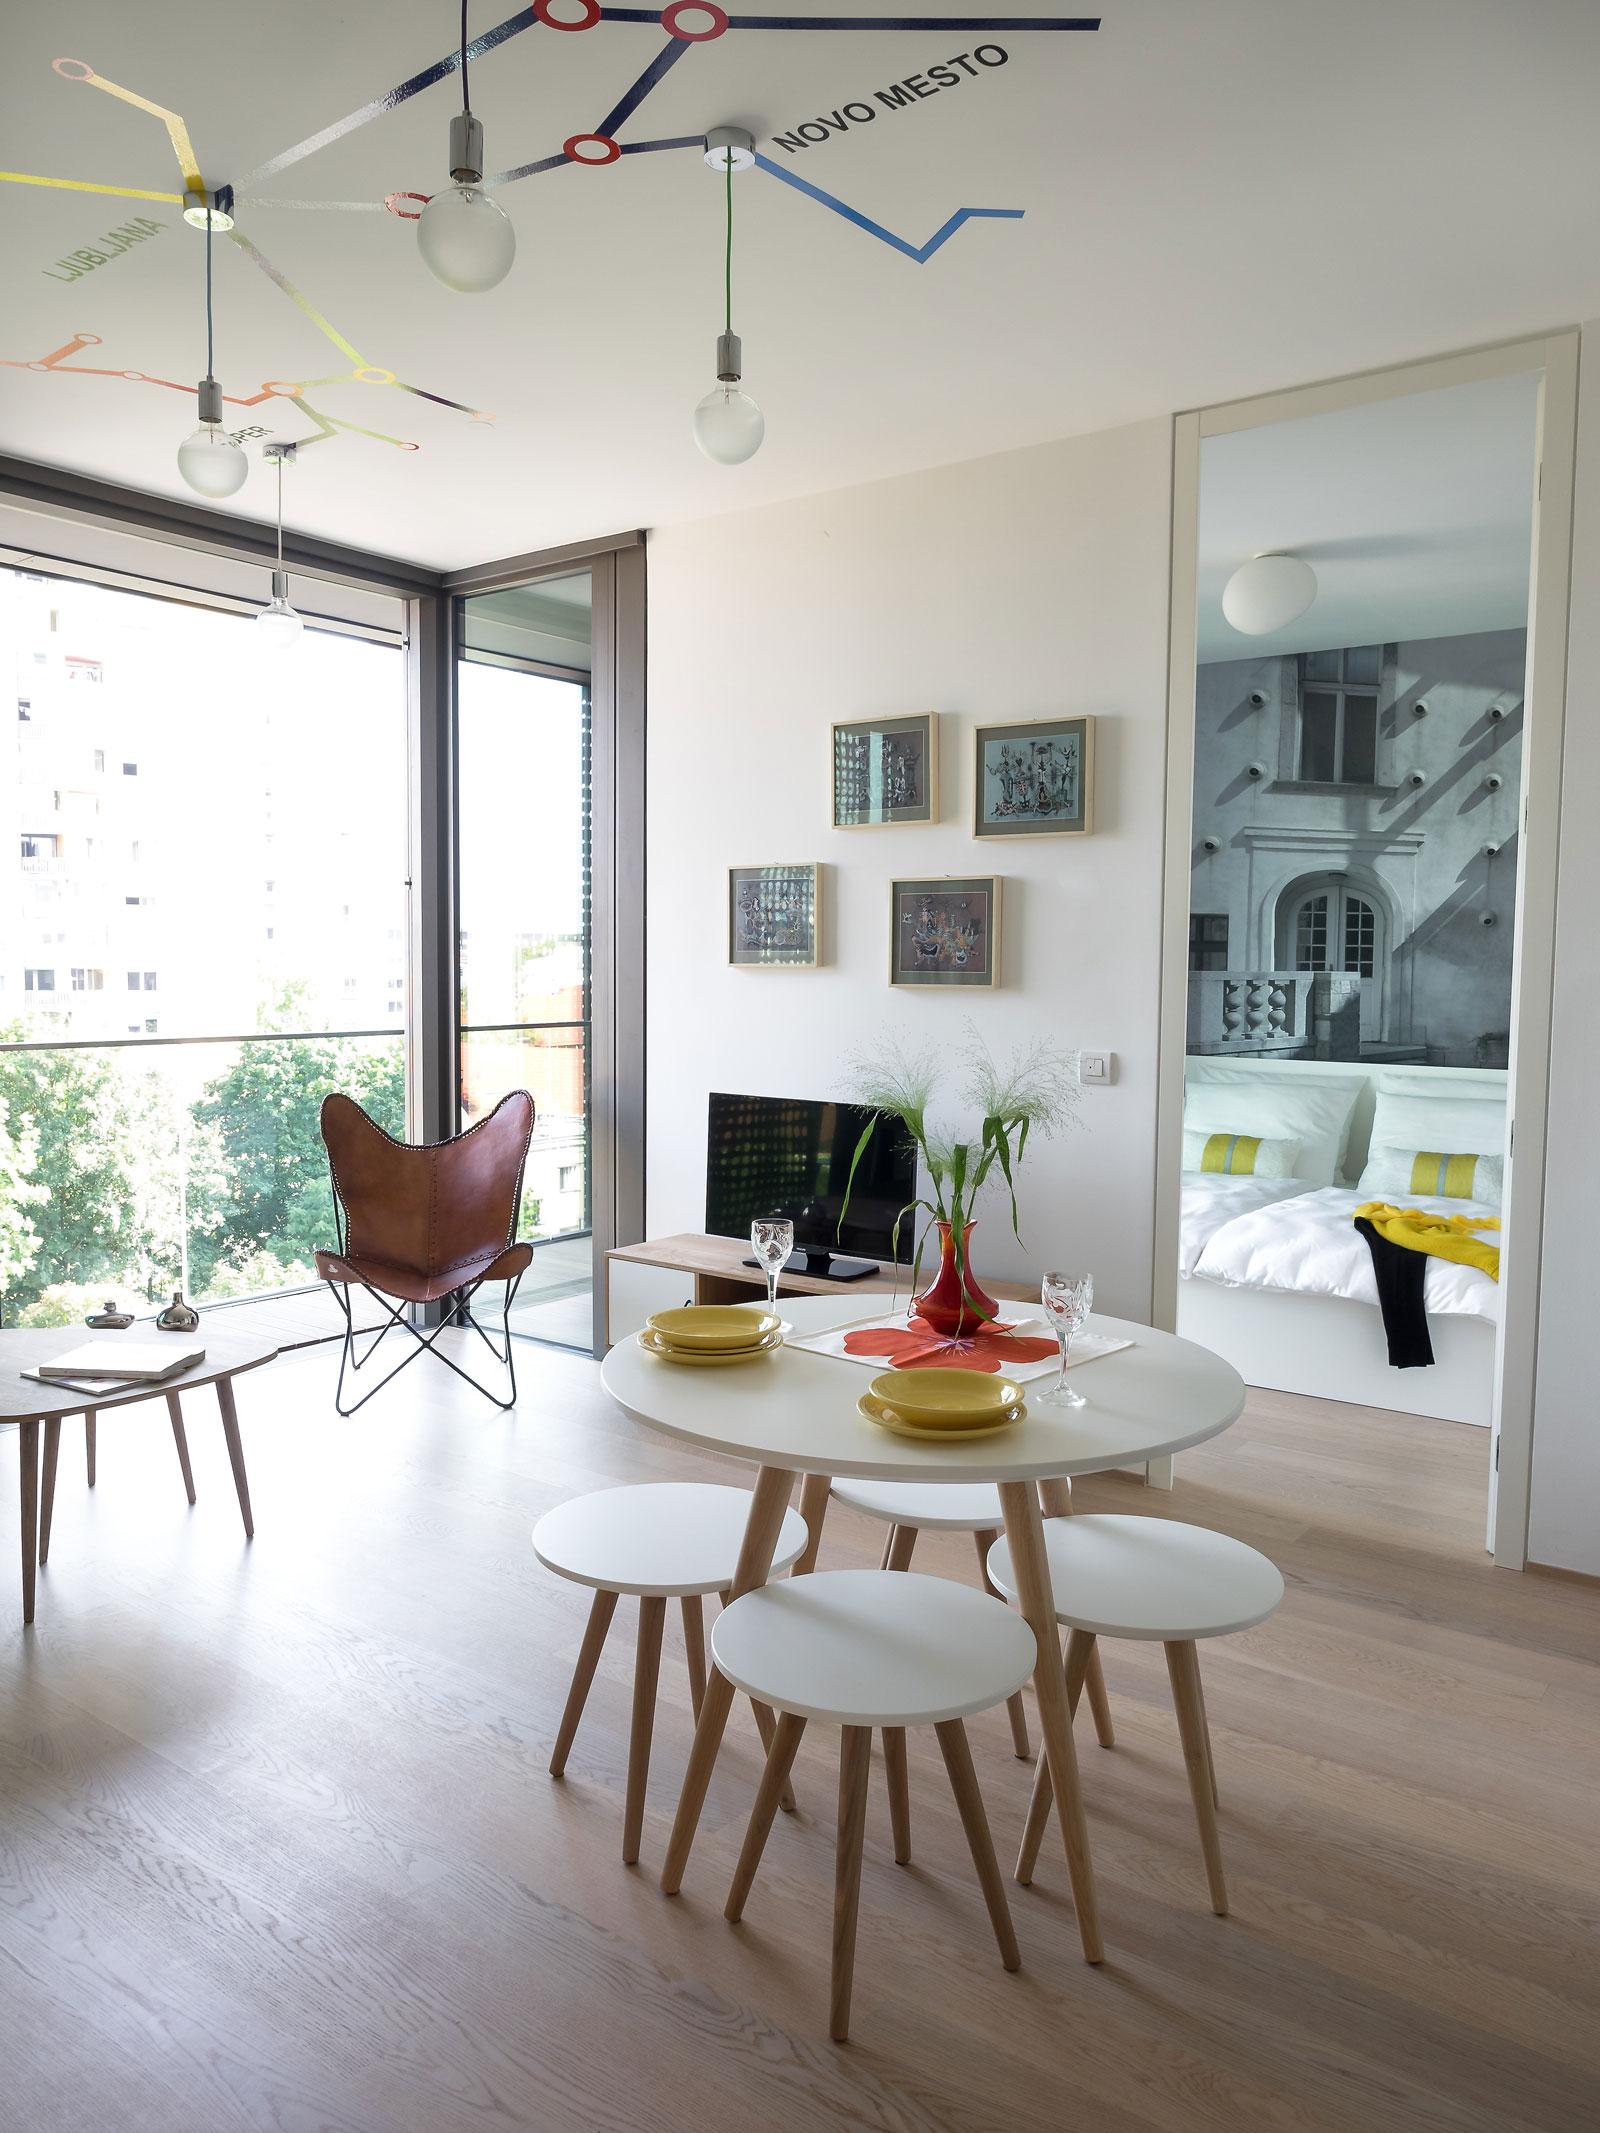 Apartment in Ljubljana by GAO architects-12